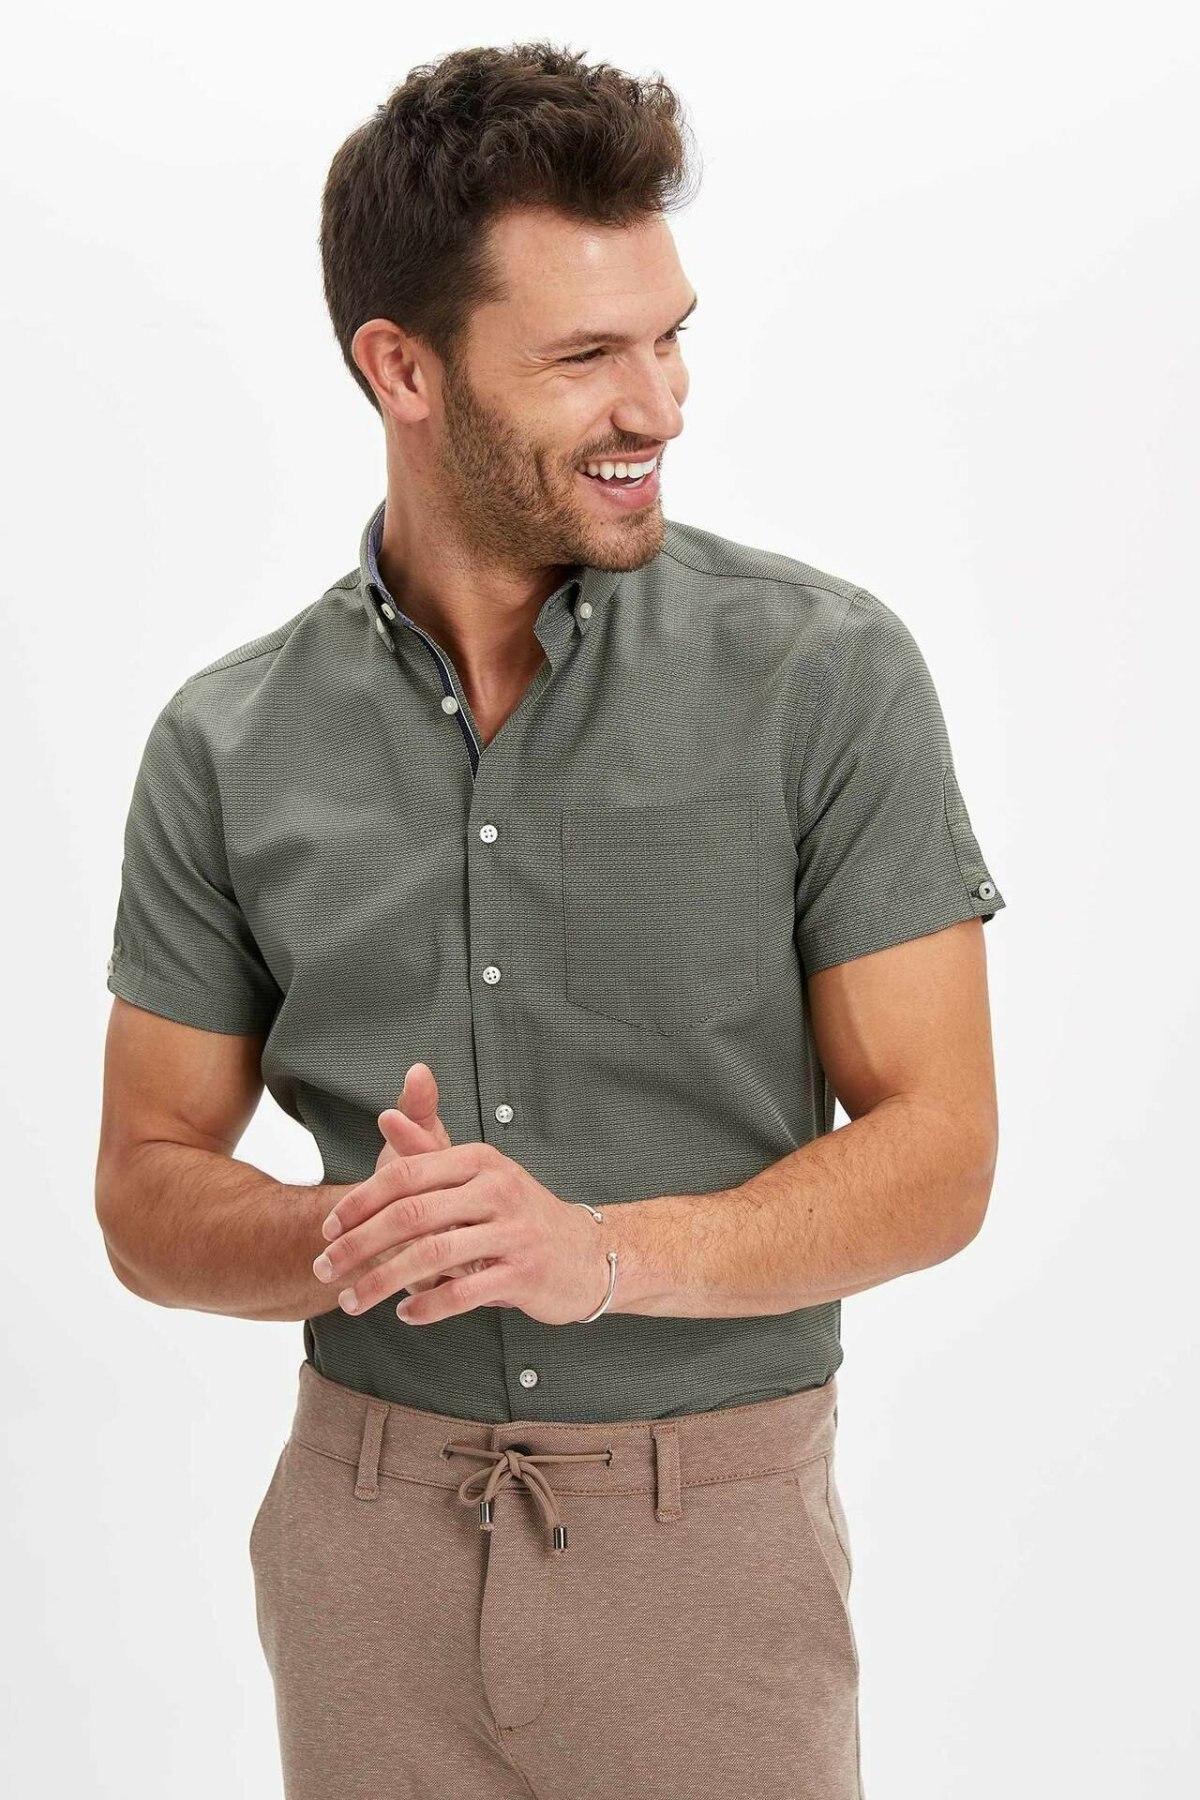 DeFacto Man Short Sleeve Shirt Men's Summer Shirts Men's Smart Casual Shirts Men's Solid Color Shirts-N6300AZ20SM